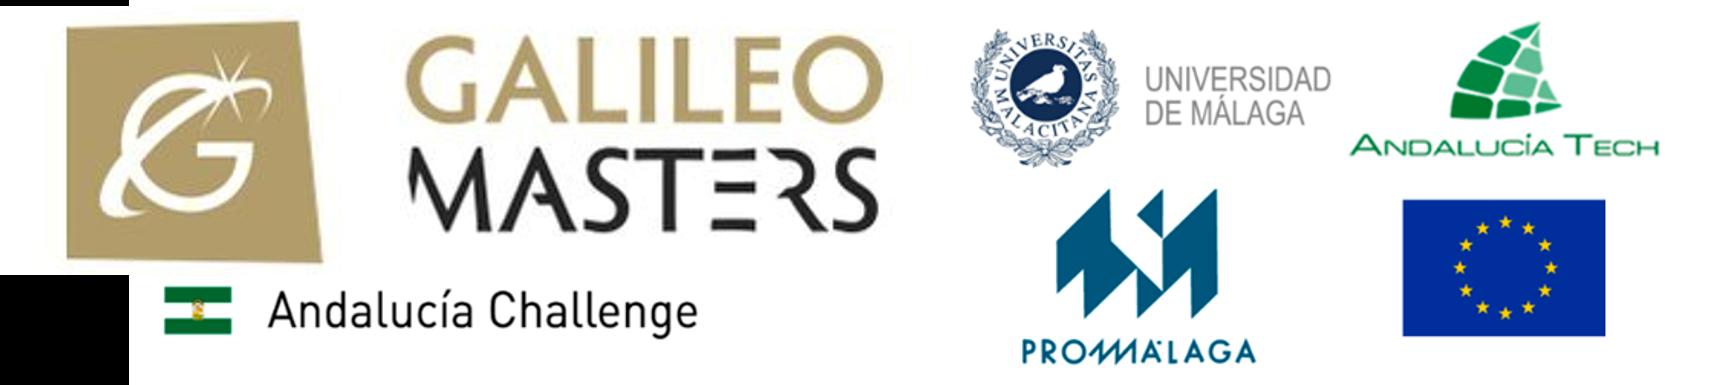 Galileo Master 2019